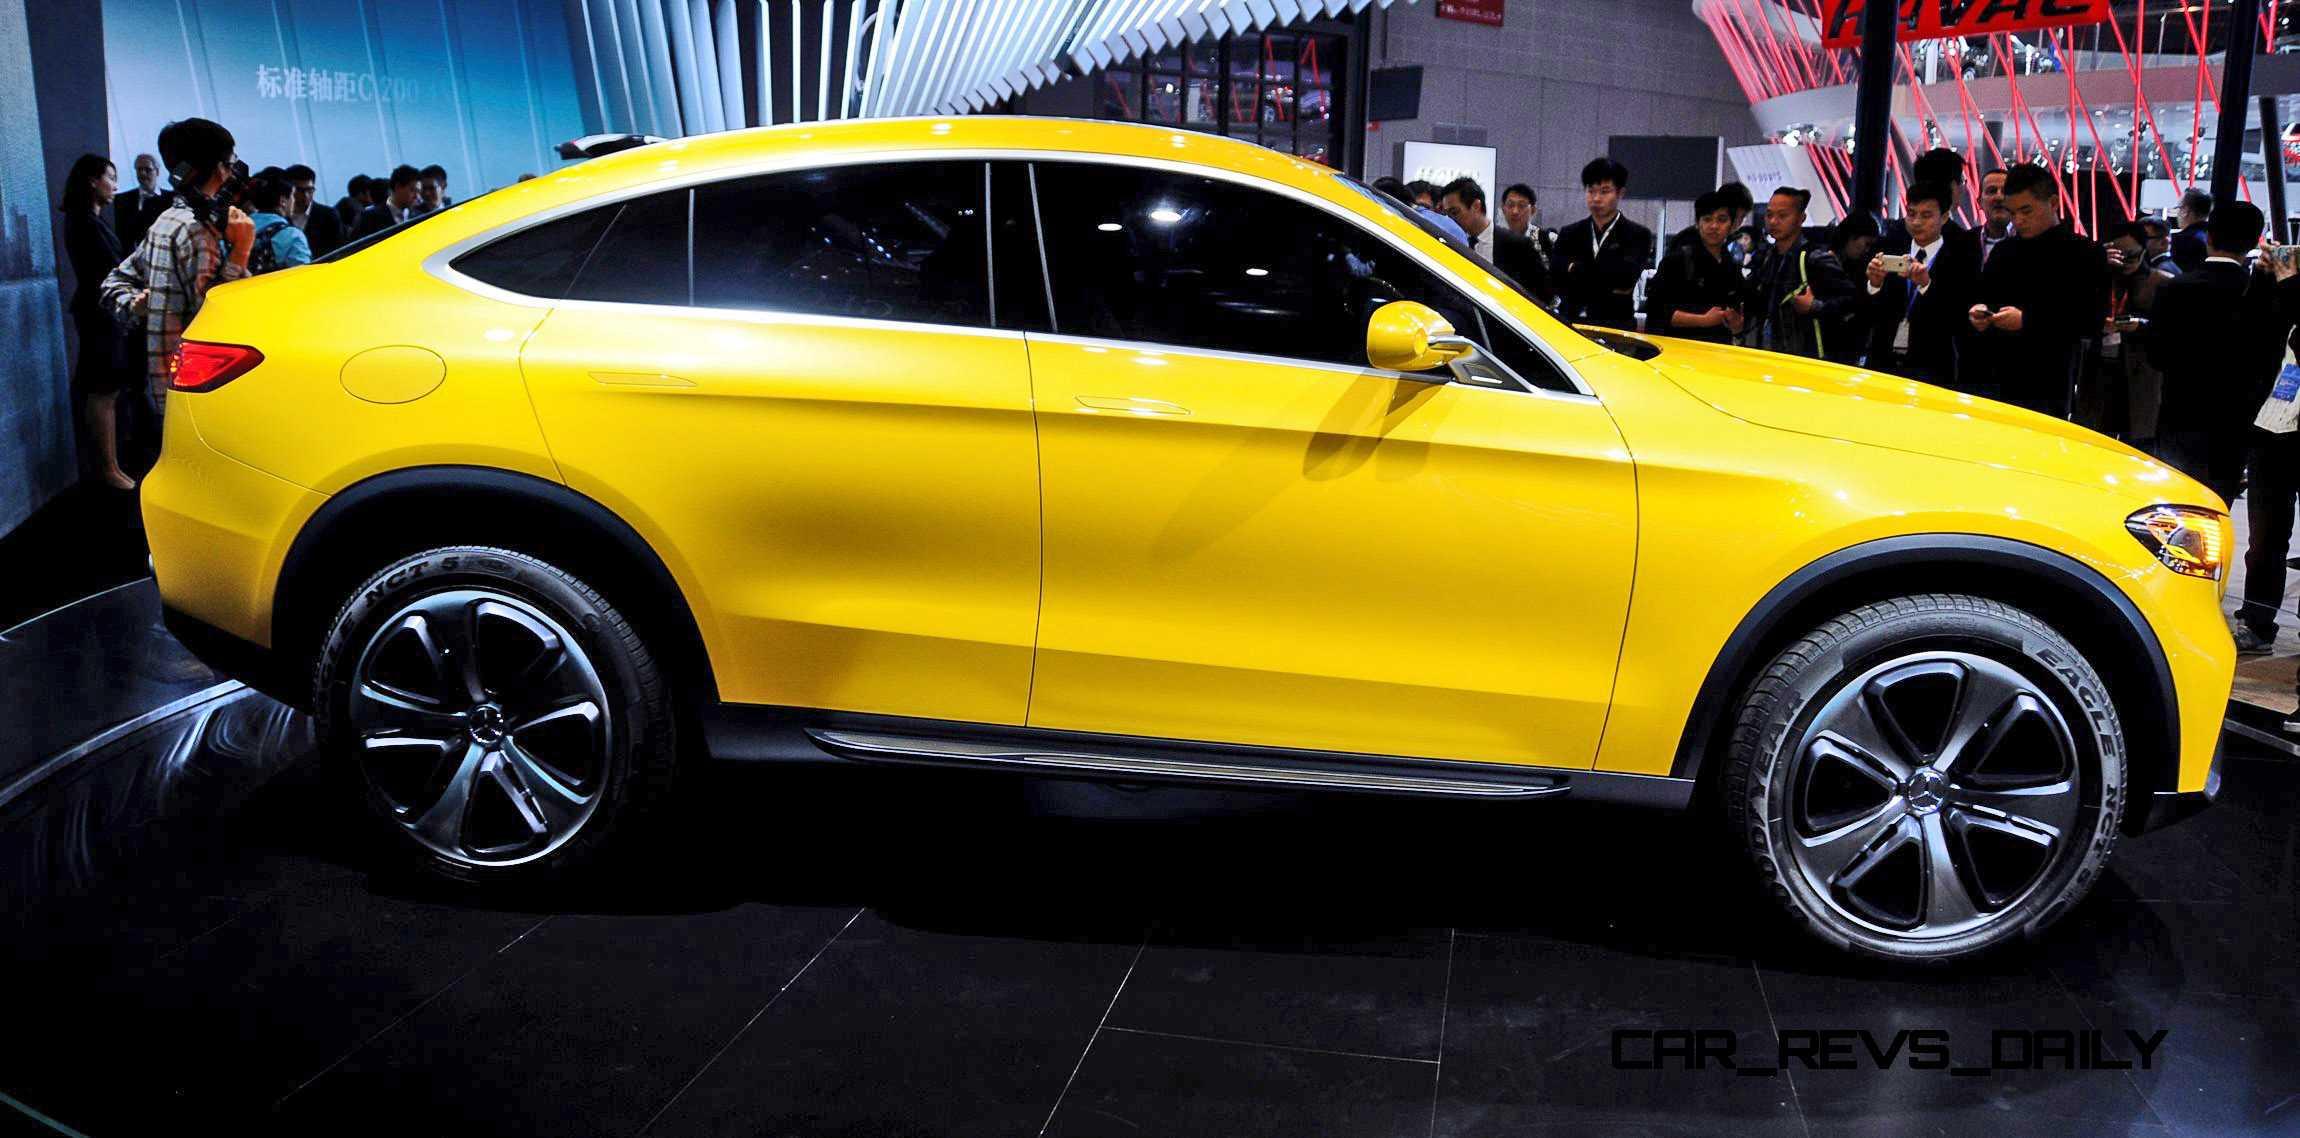 http://www.car-revs-daily.com/wp-content/uploads/2015/04/2015-Mercedes-Benz-GLC-Coupe-Concept-151.jpg